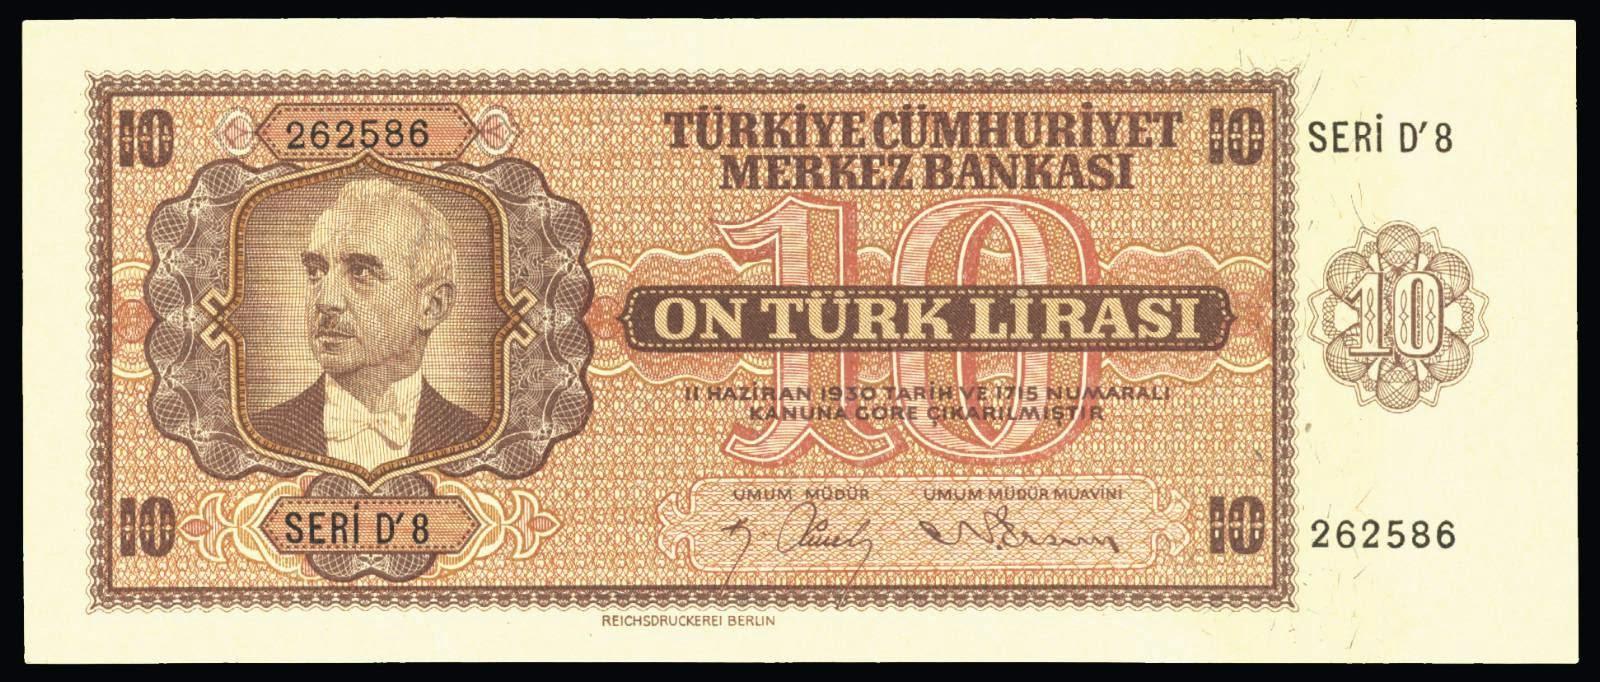 Turkey currency 10 Turkish Lira banknote 1942 İsmet İnönü